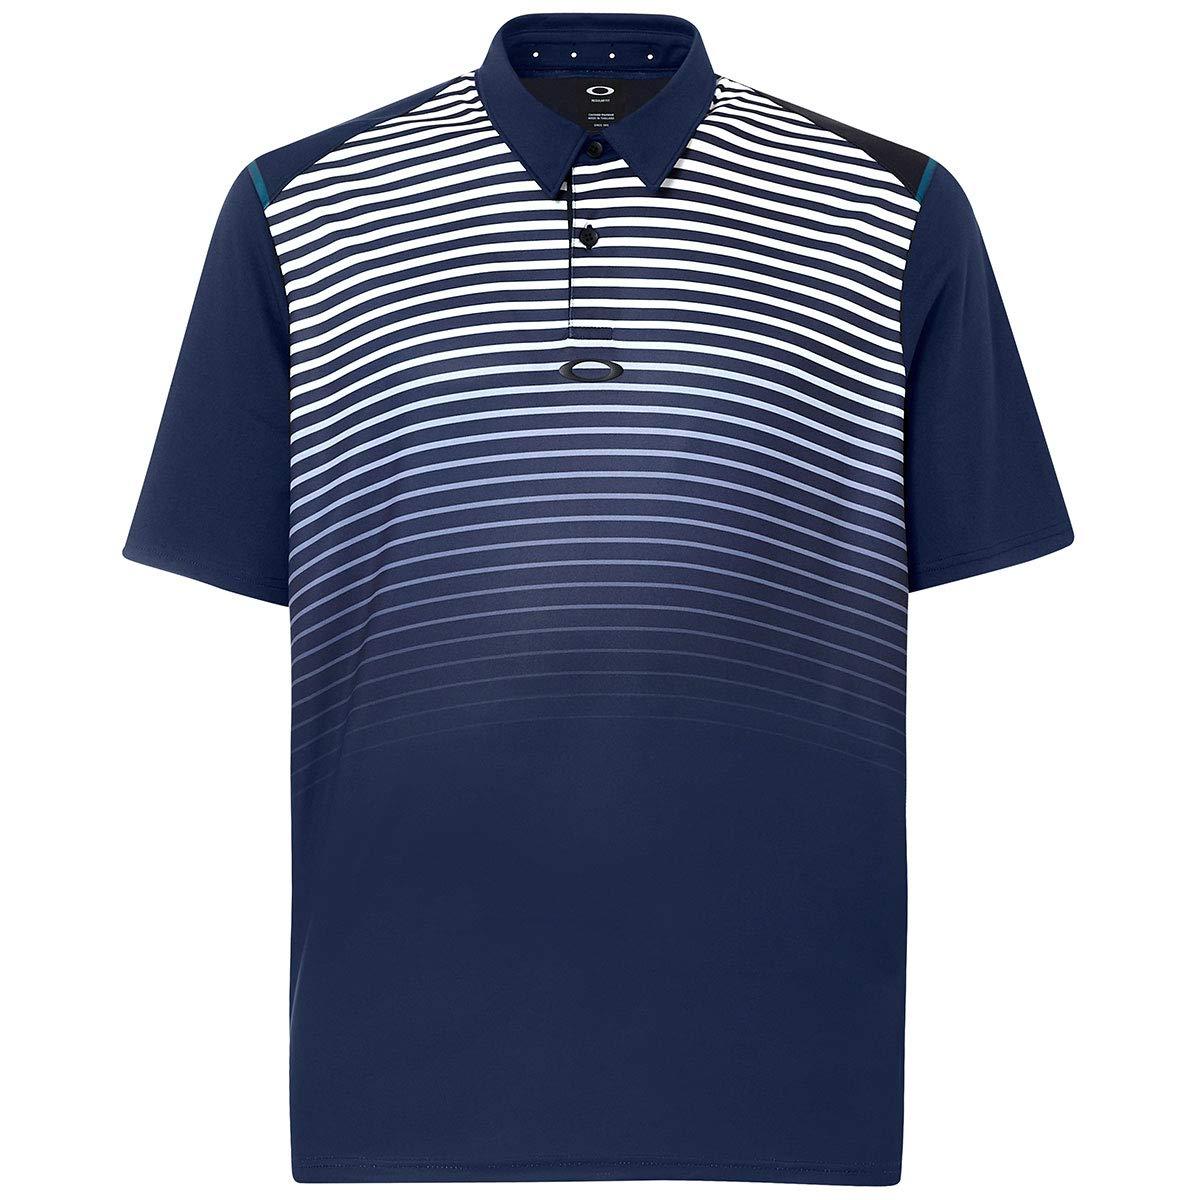 Oakley Mens Polo Shirt Ss Striped Ellipse, Fathom, M: Amazon.es ...